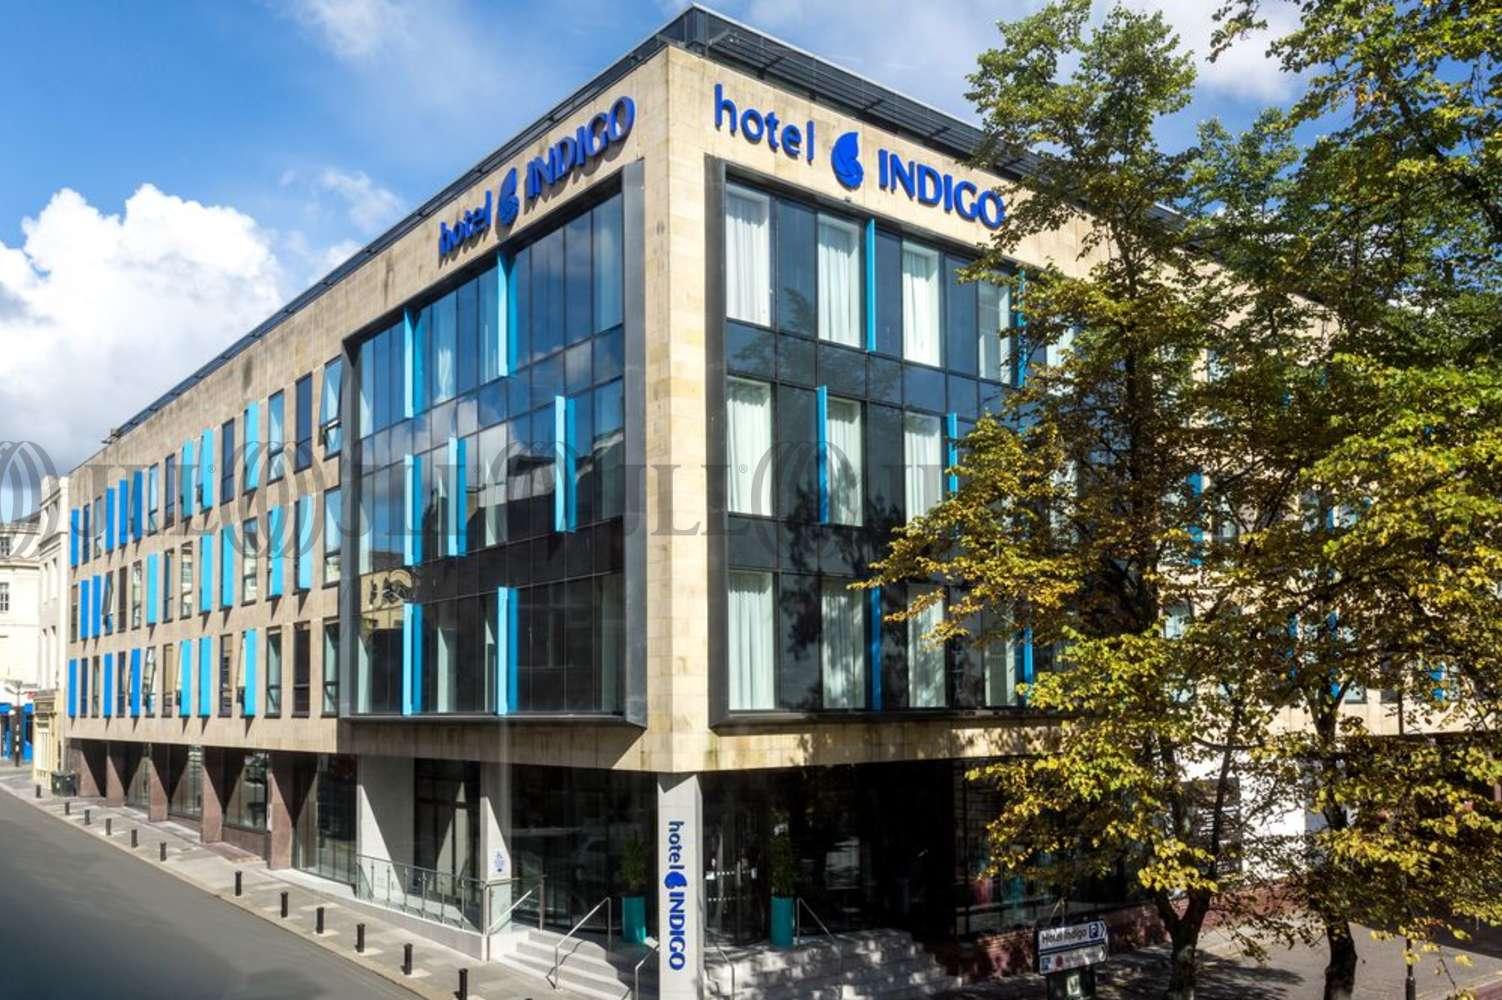 Hotel Newcastle upon tyne, NE1 5XU - Hotel Indigo, Newcastle - 82465